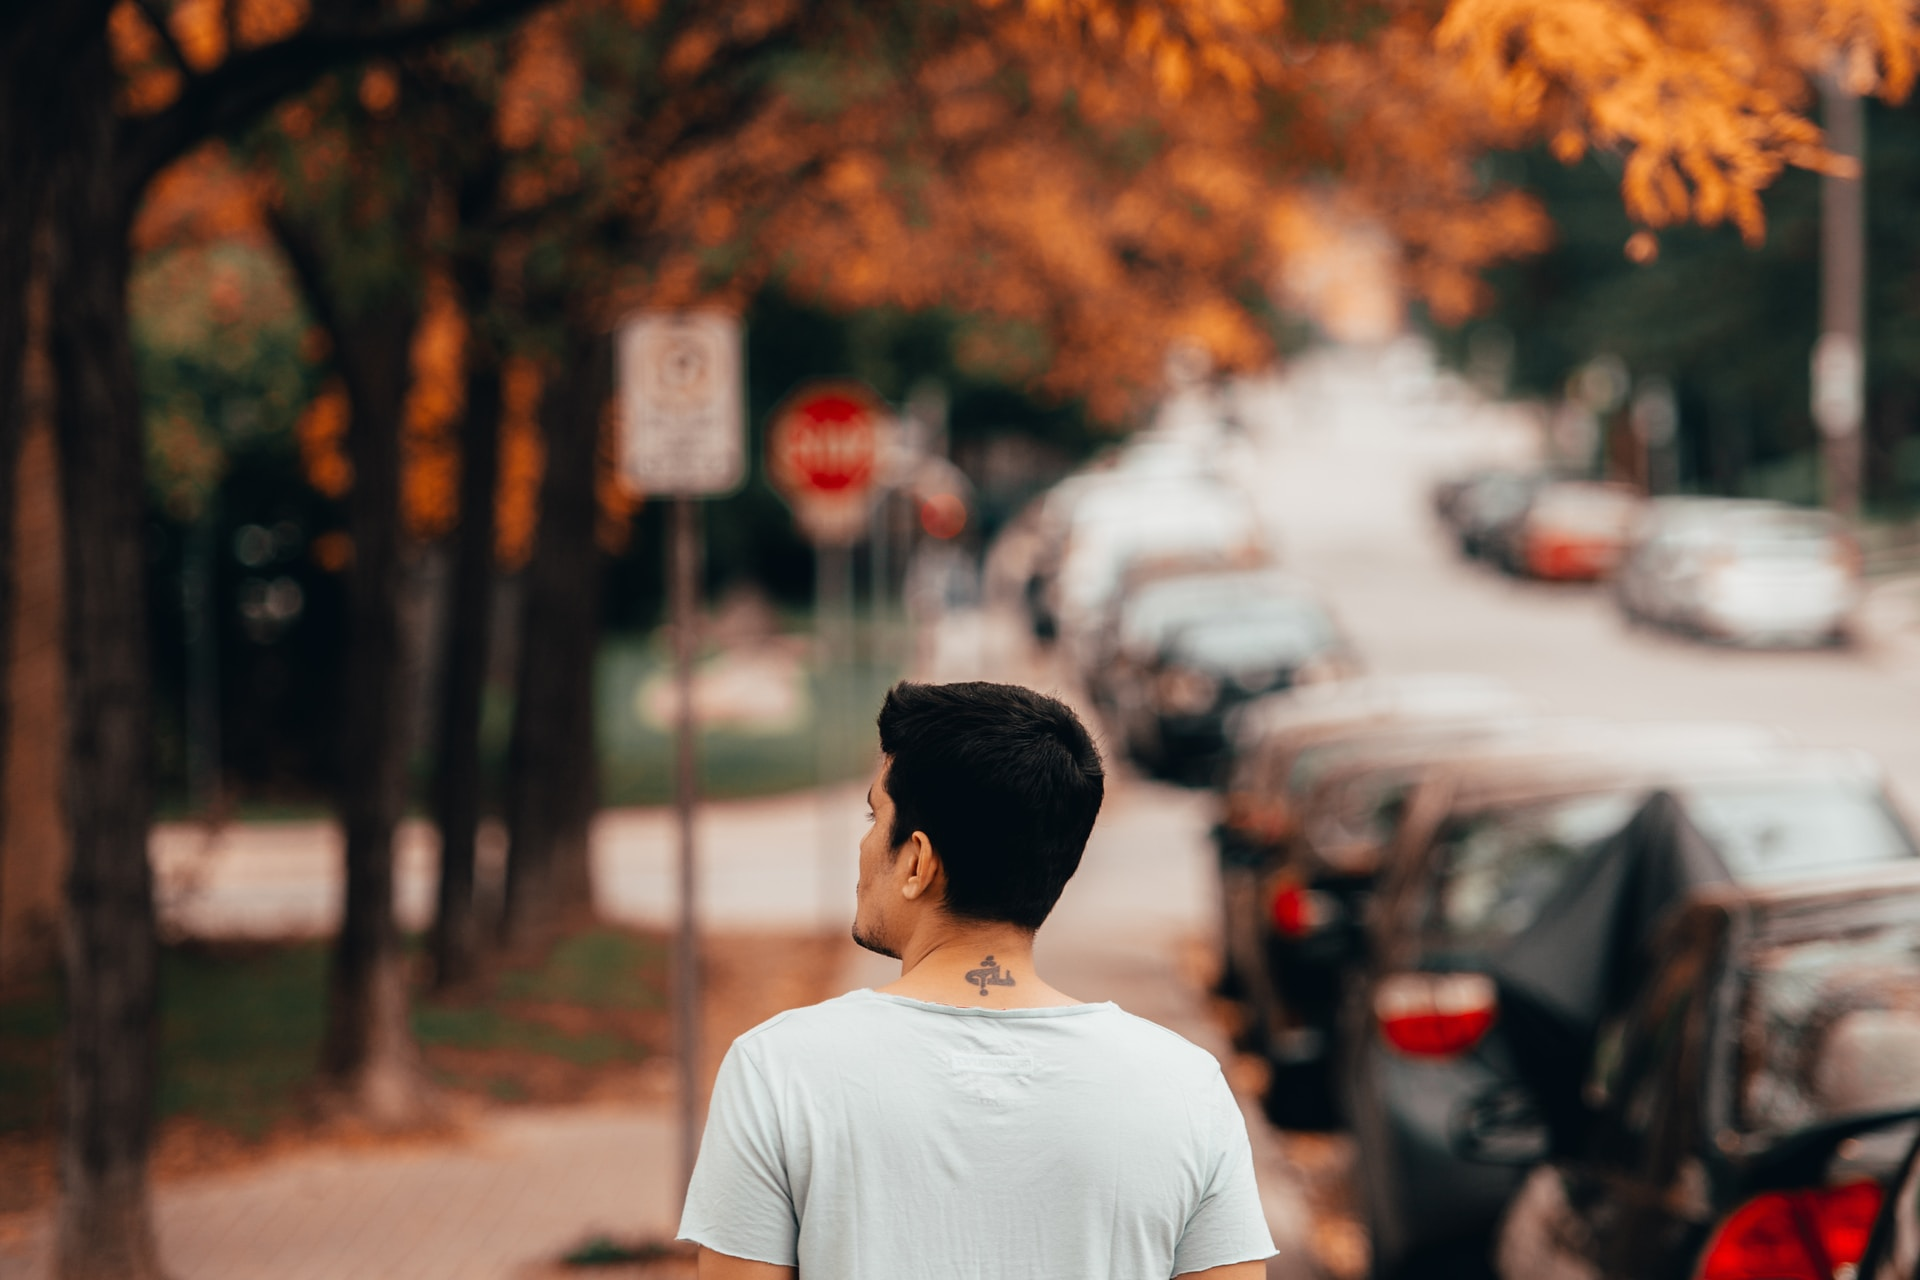 man wearing white shirt walking near vehicles and tree